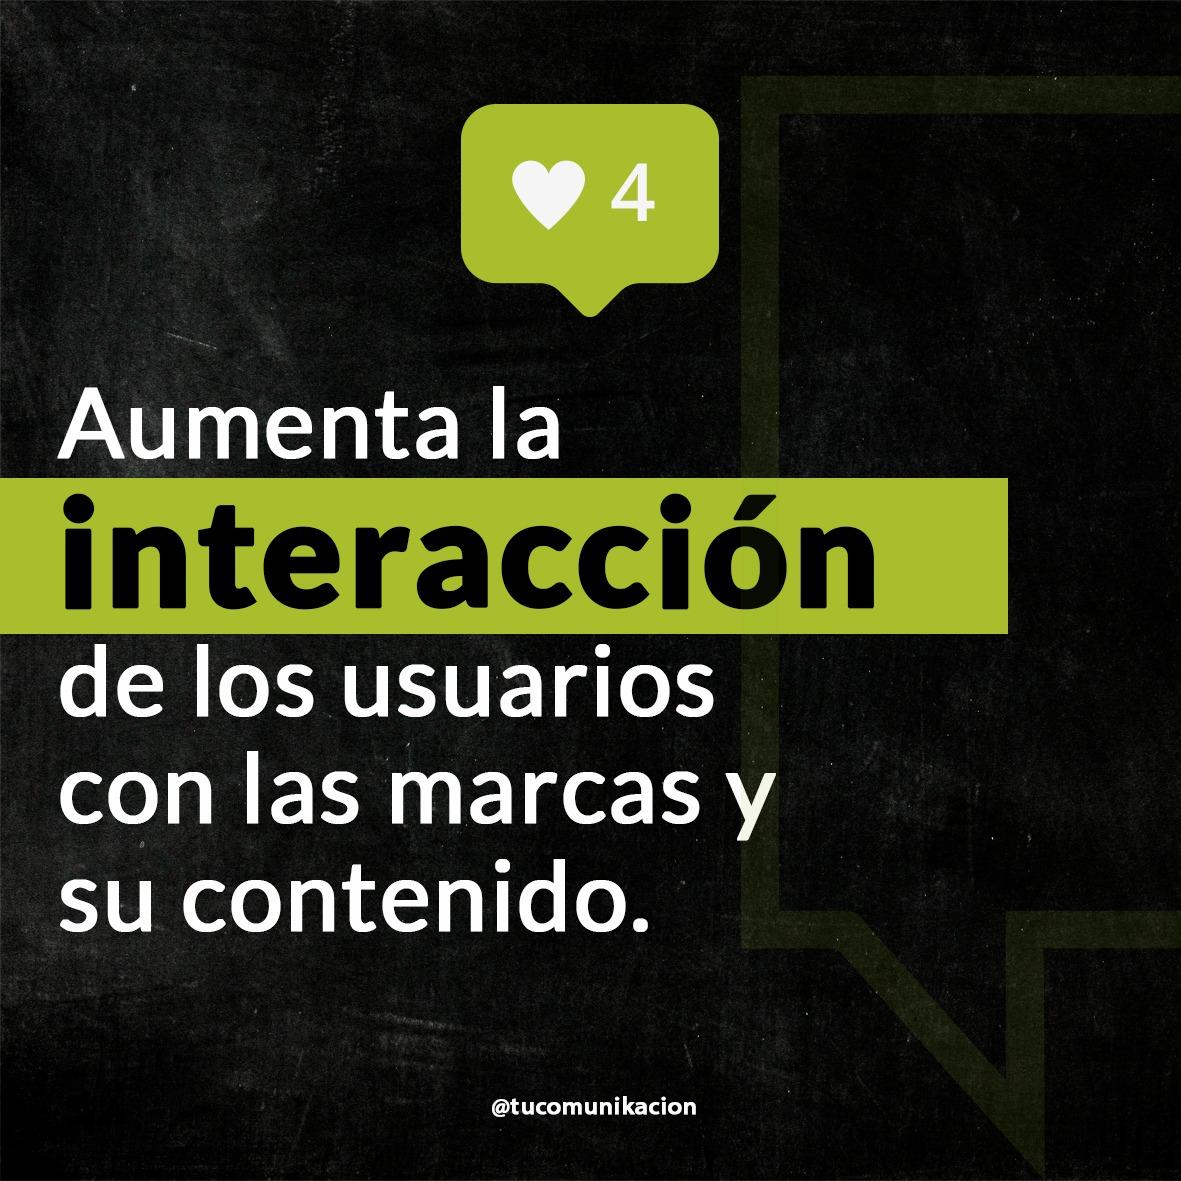 tucomunikacion